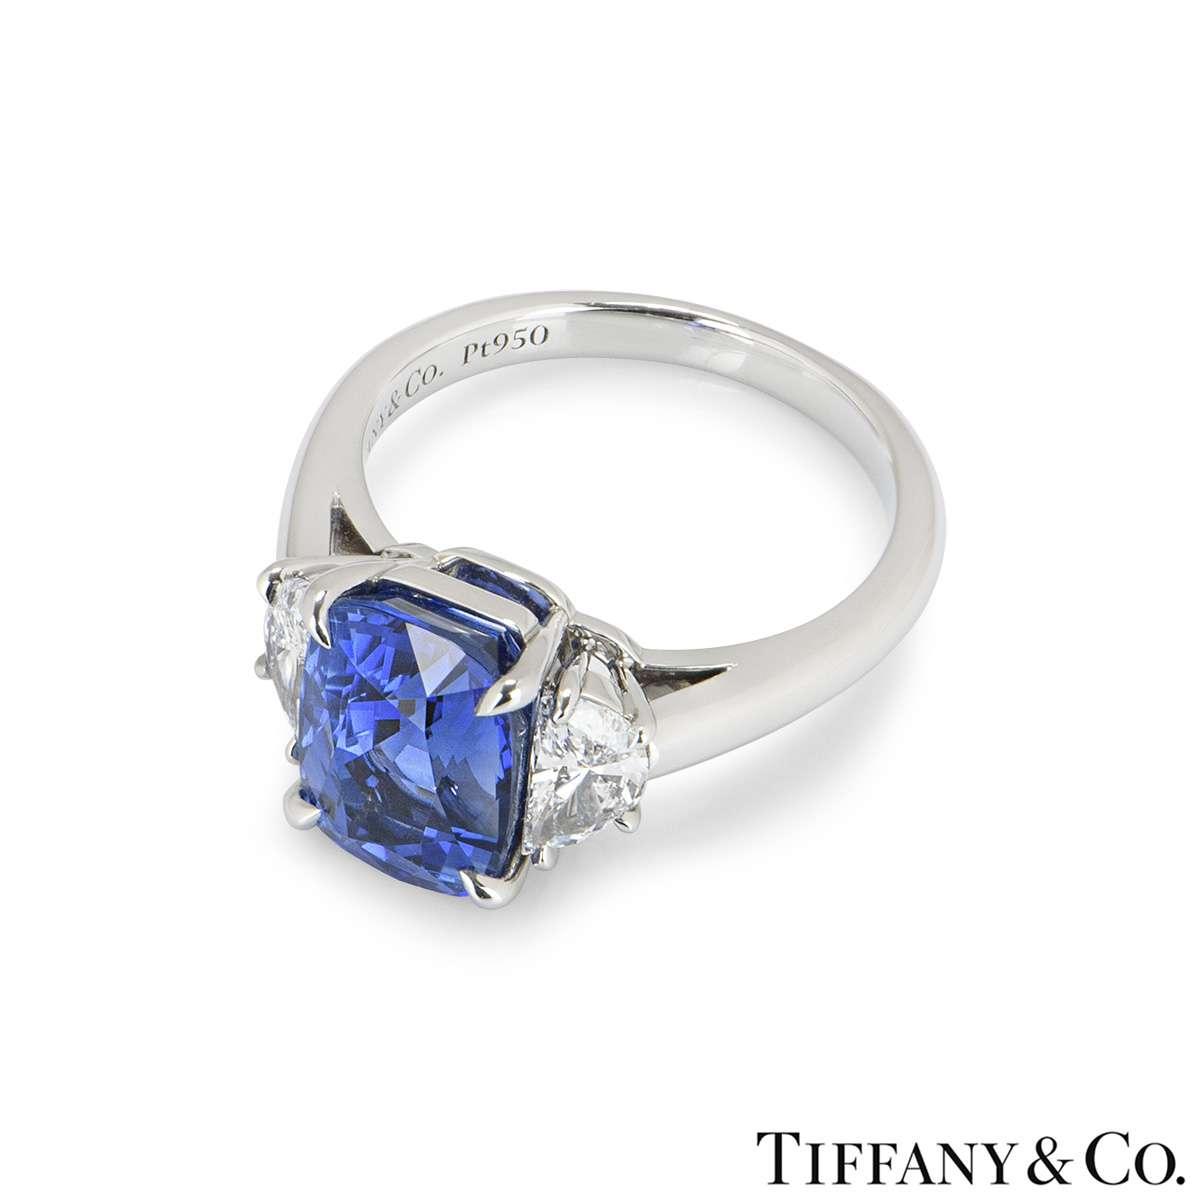 Tiffany & Co. Platinum Sapphire & Diamond Ring